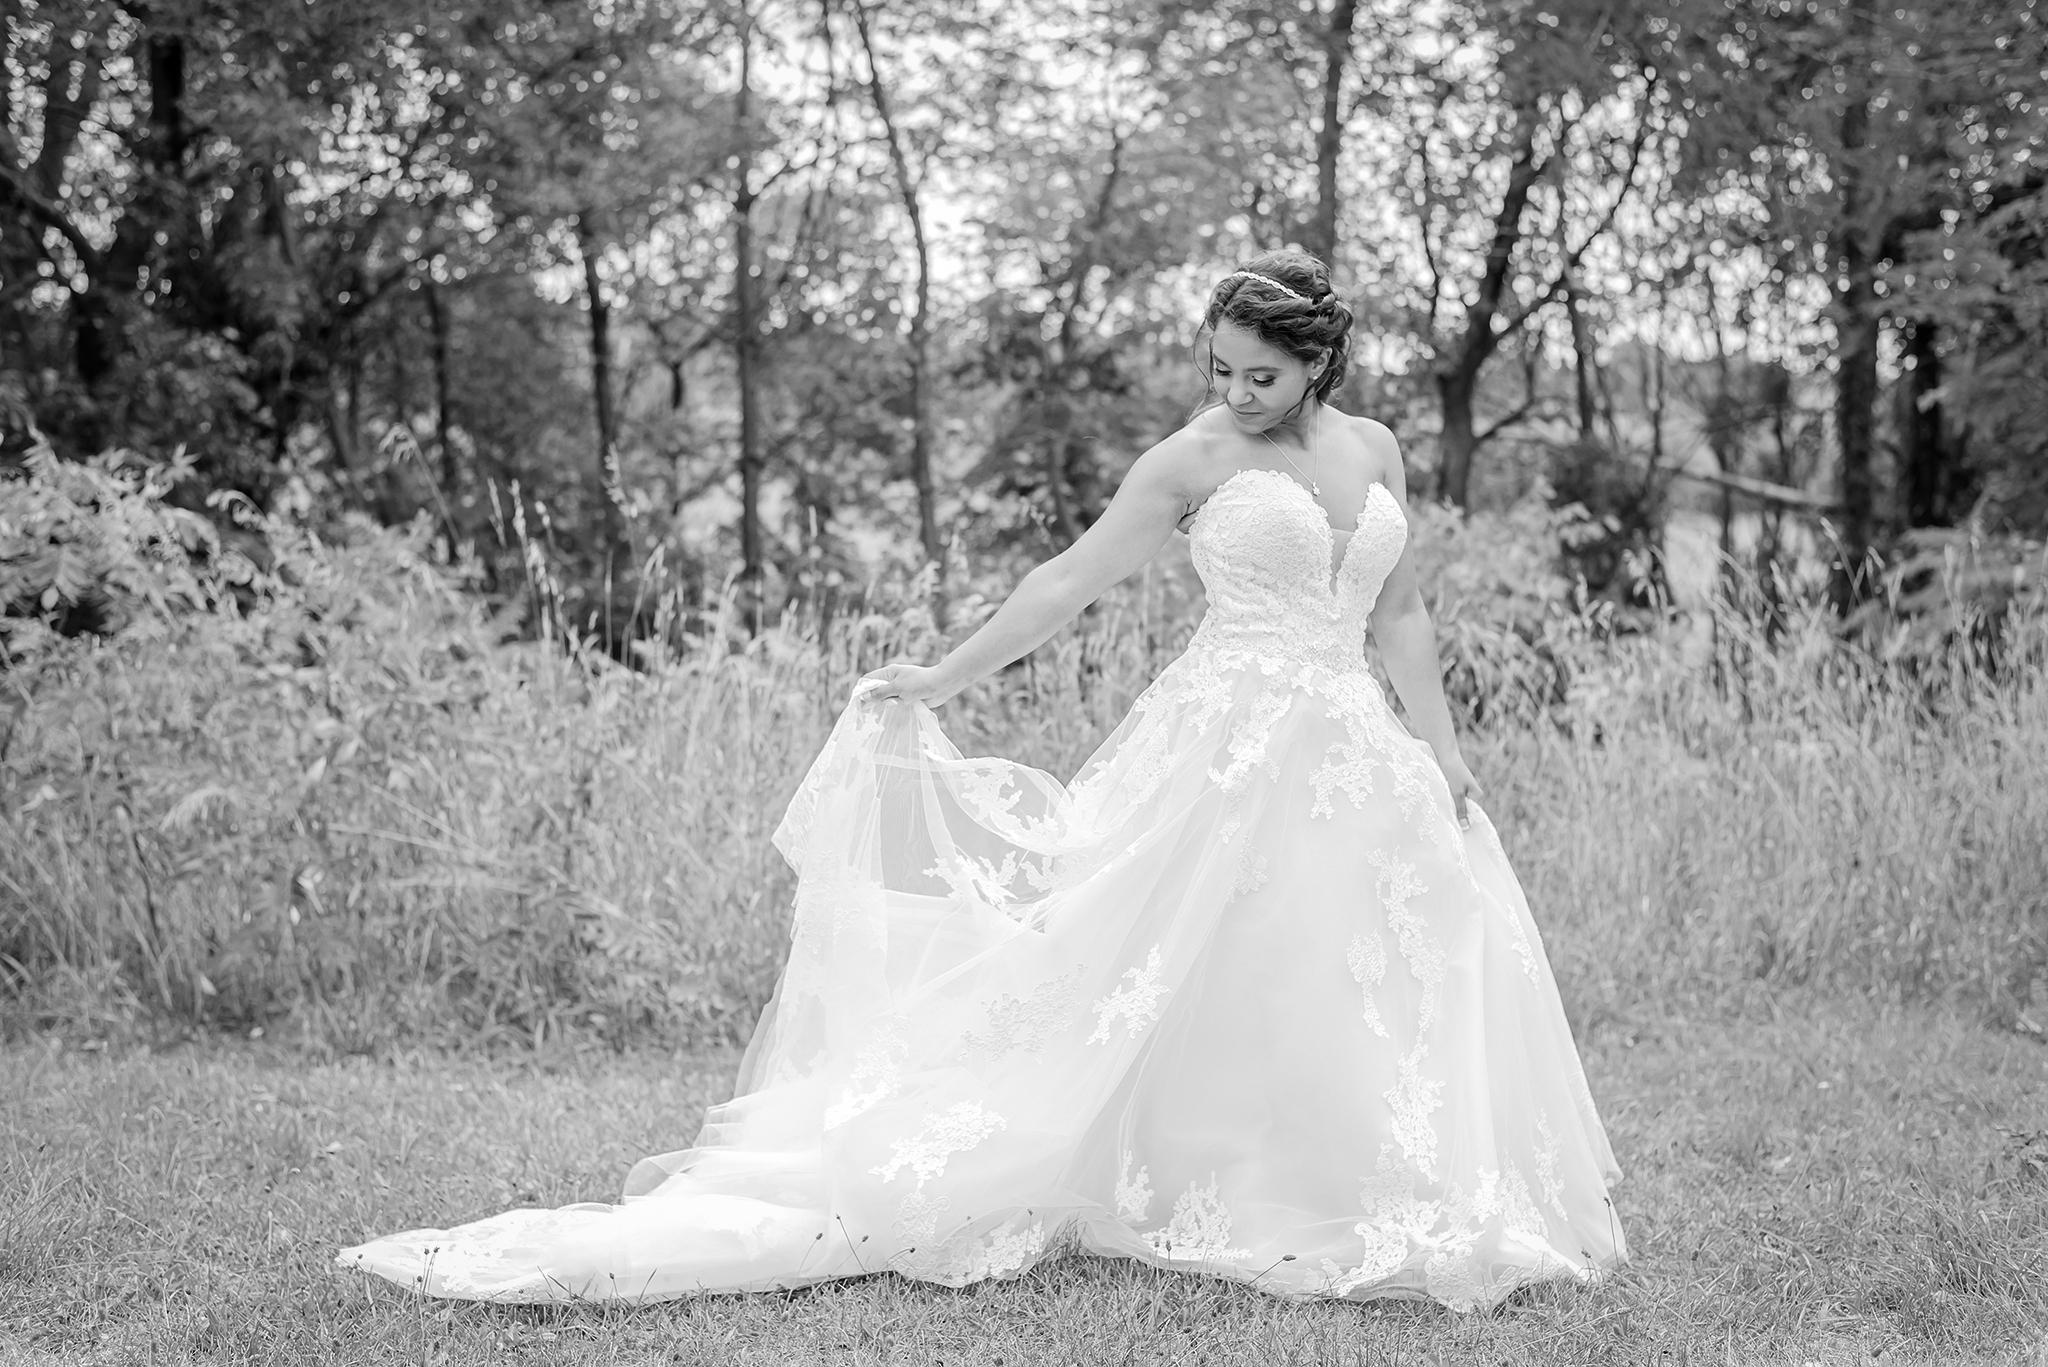 Lindsay-Adkins-Photography-Michigan-Wedding-Photographer-Miller-15